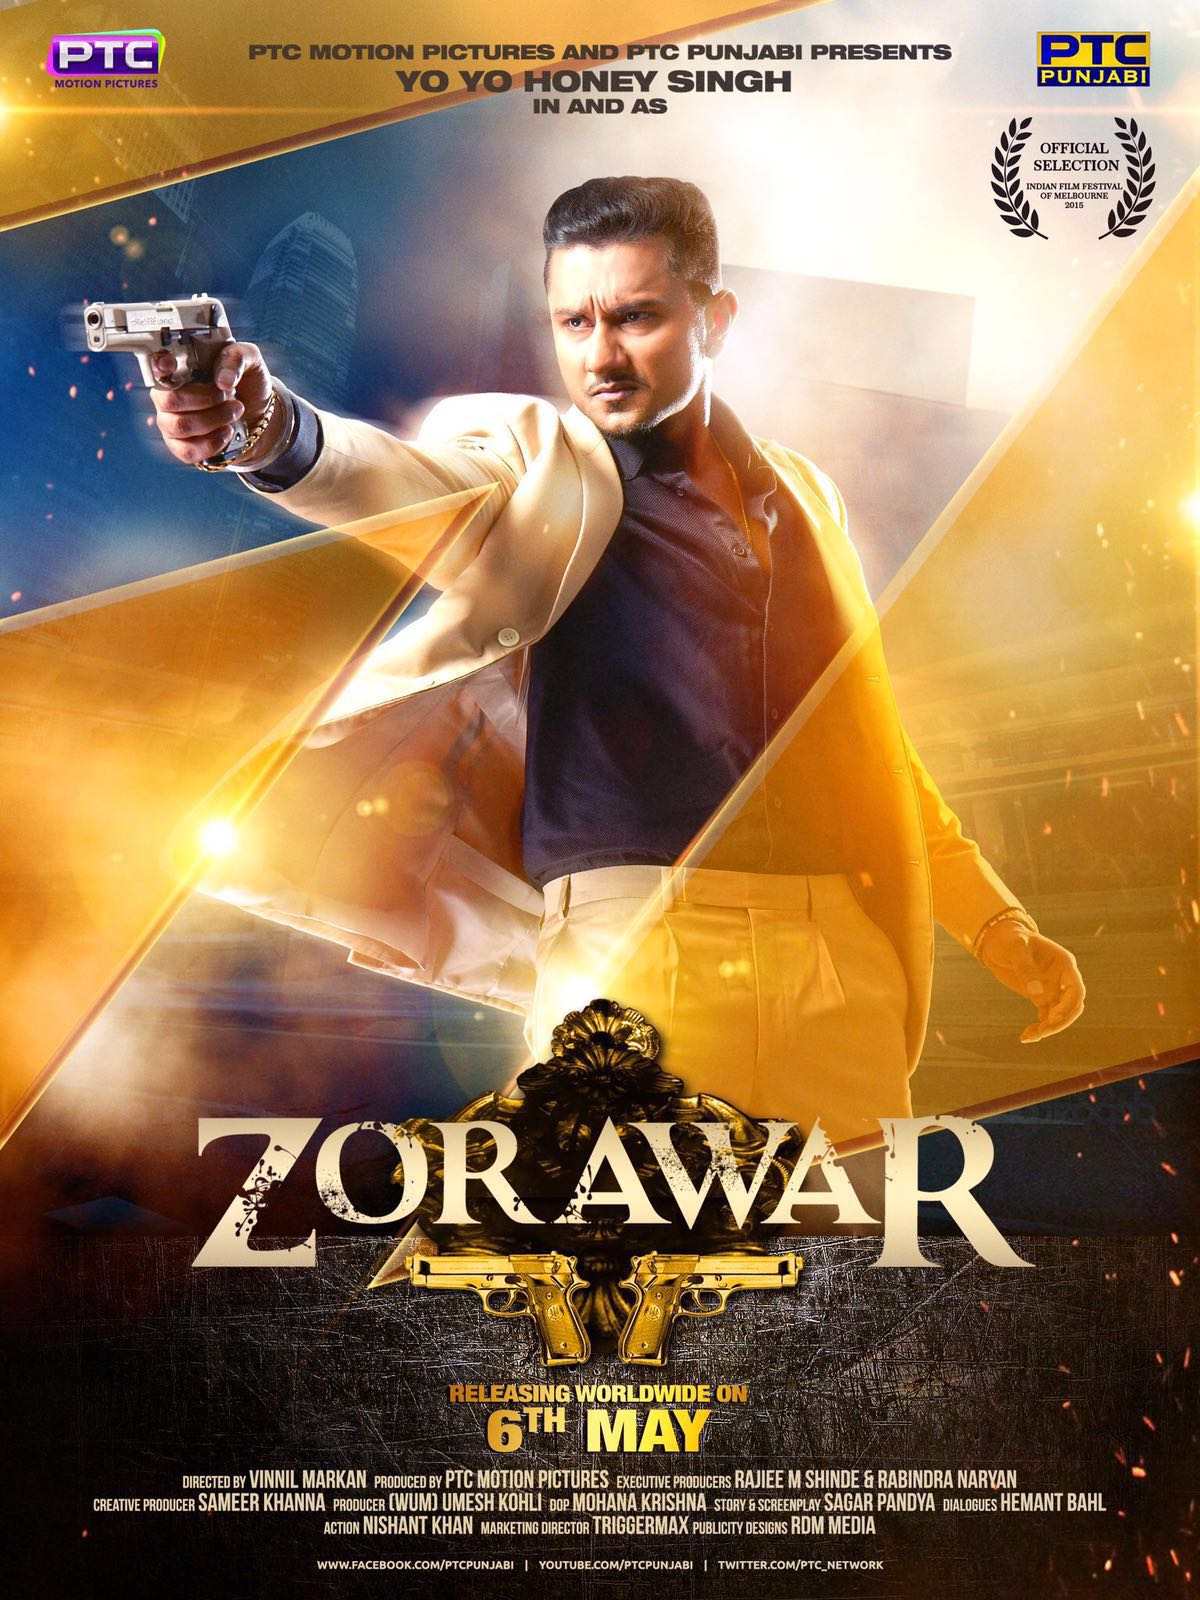 Poster Zorawar movie